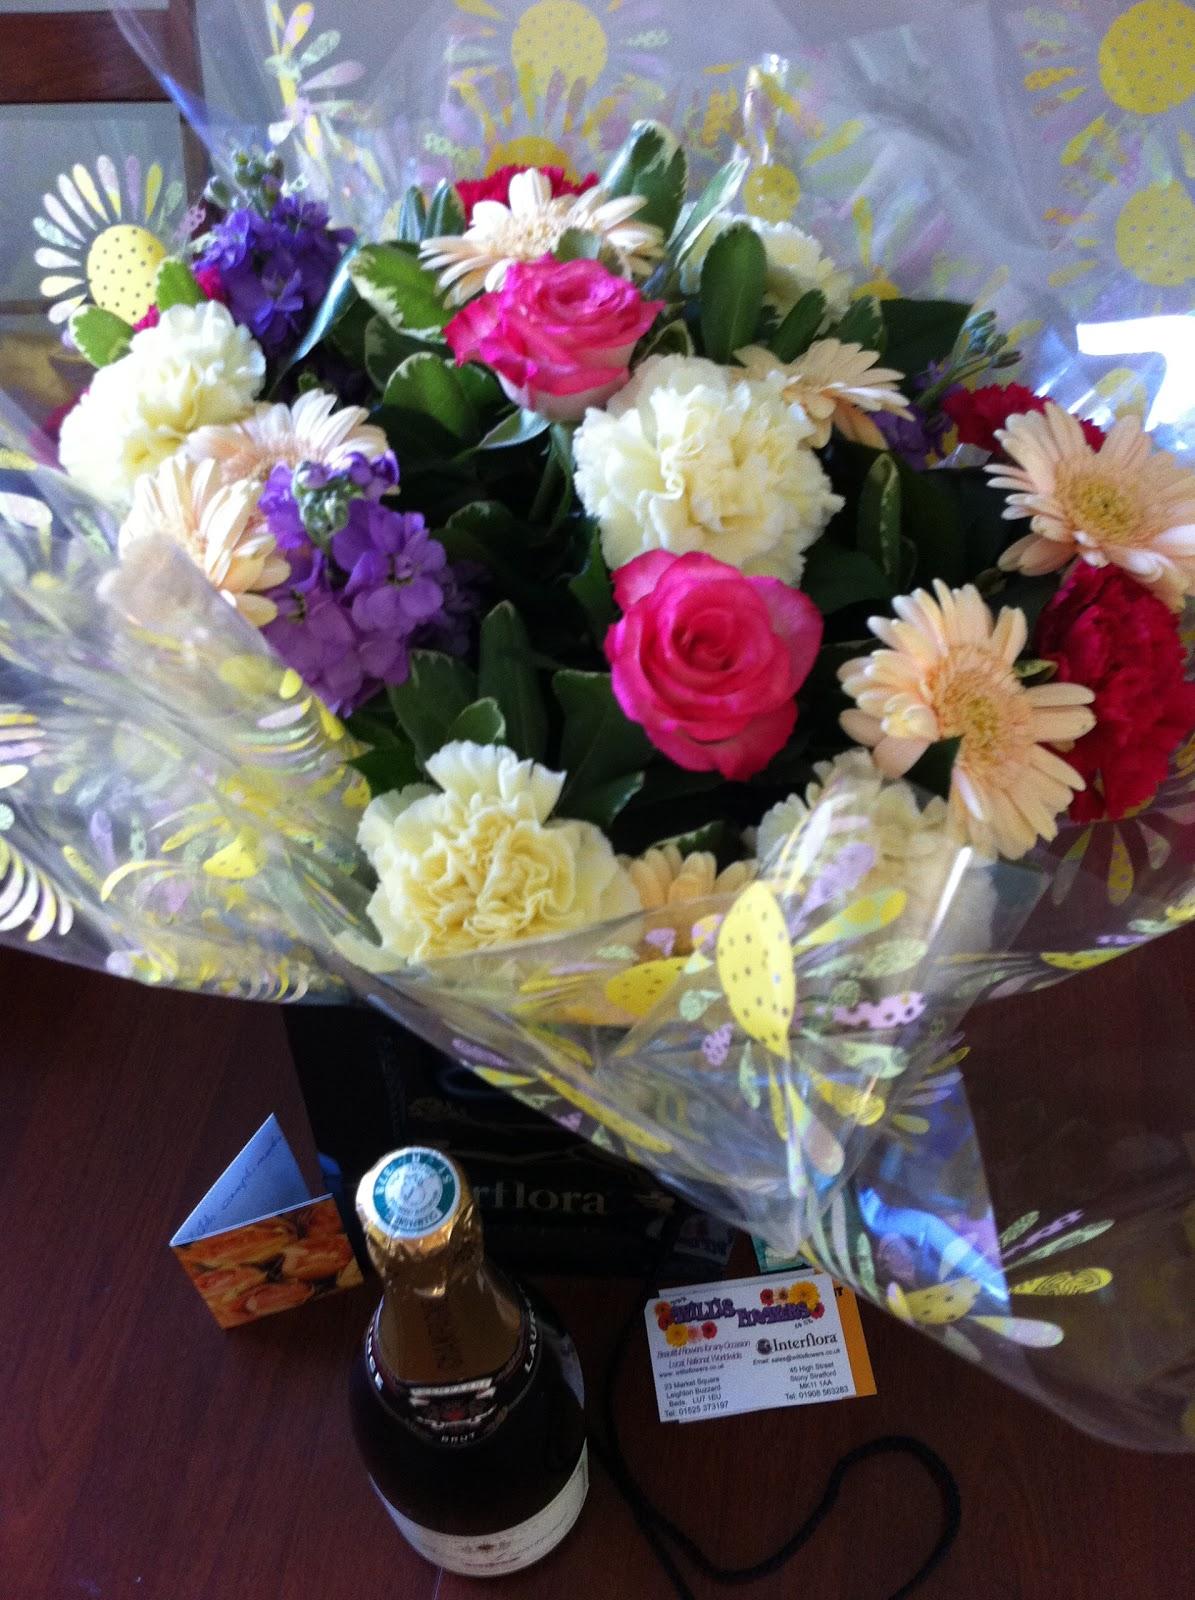 Iinterflora awesome image of interflora uk funeral flowers thinking review interflora izmirmasajfo